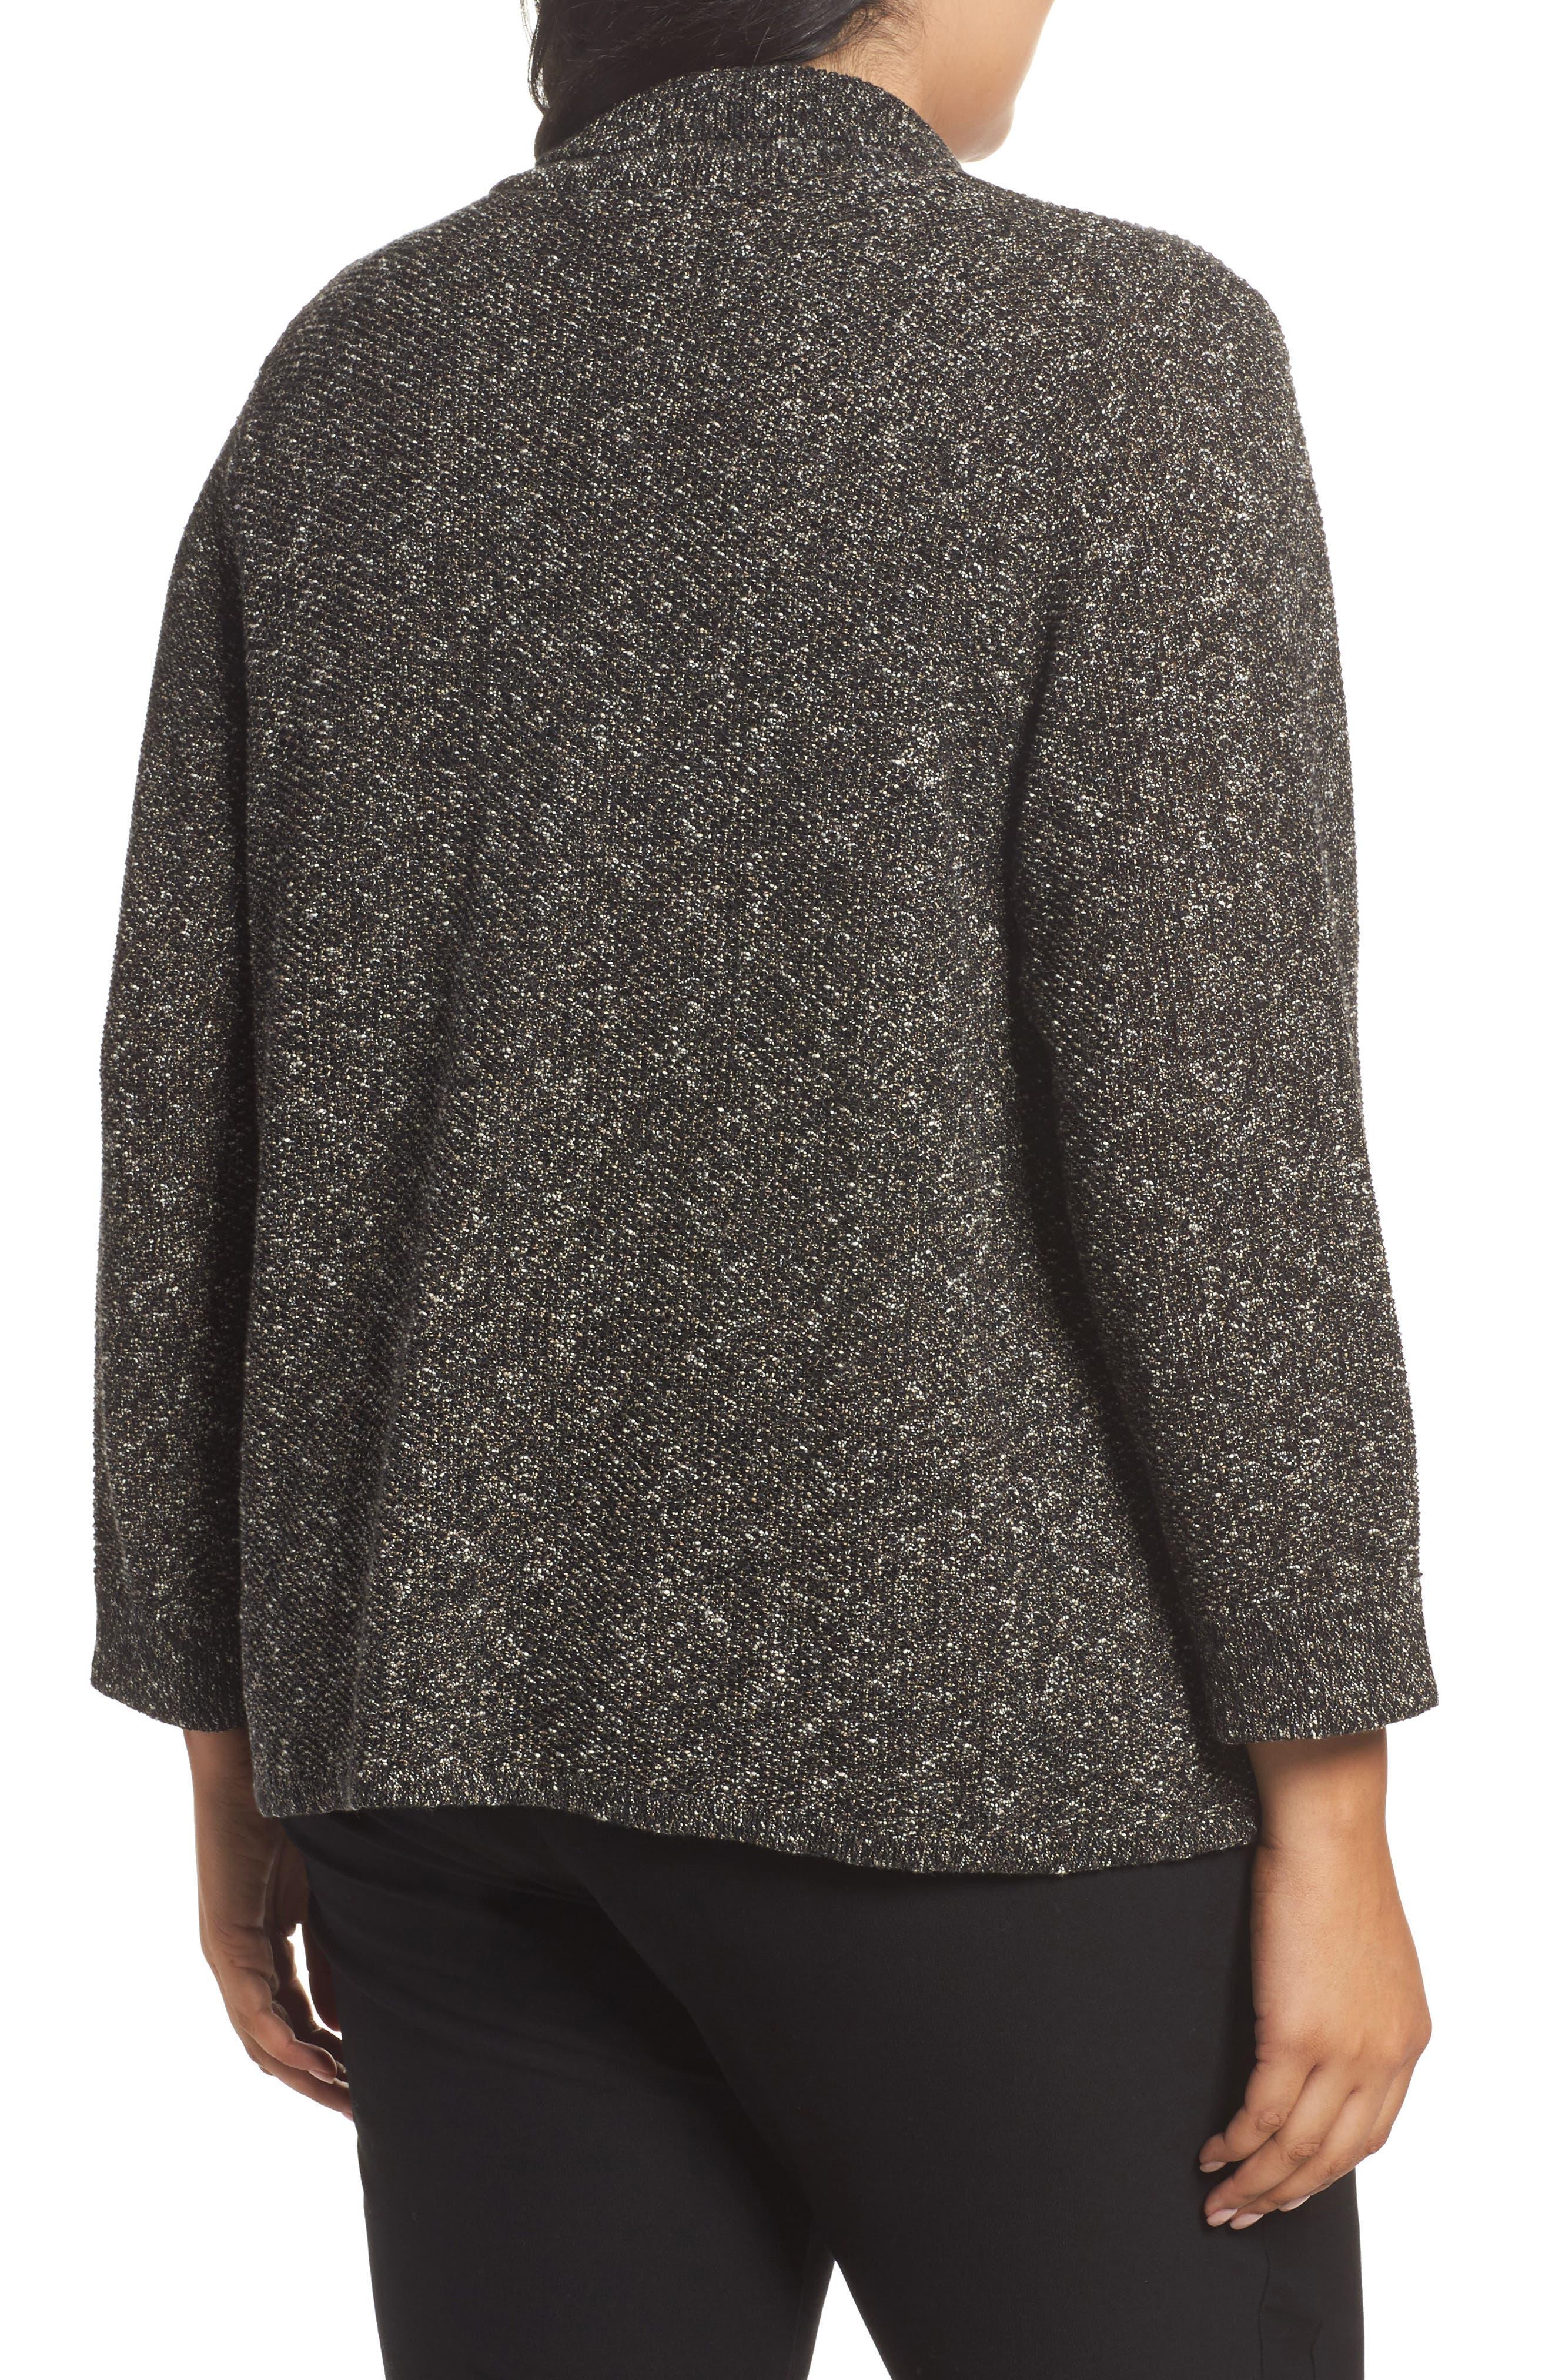 Organic Cotton Blend Sweater Jacket,                             Alternate thumbnail 2, color,                             Black